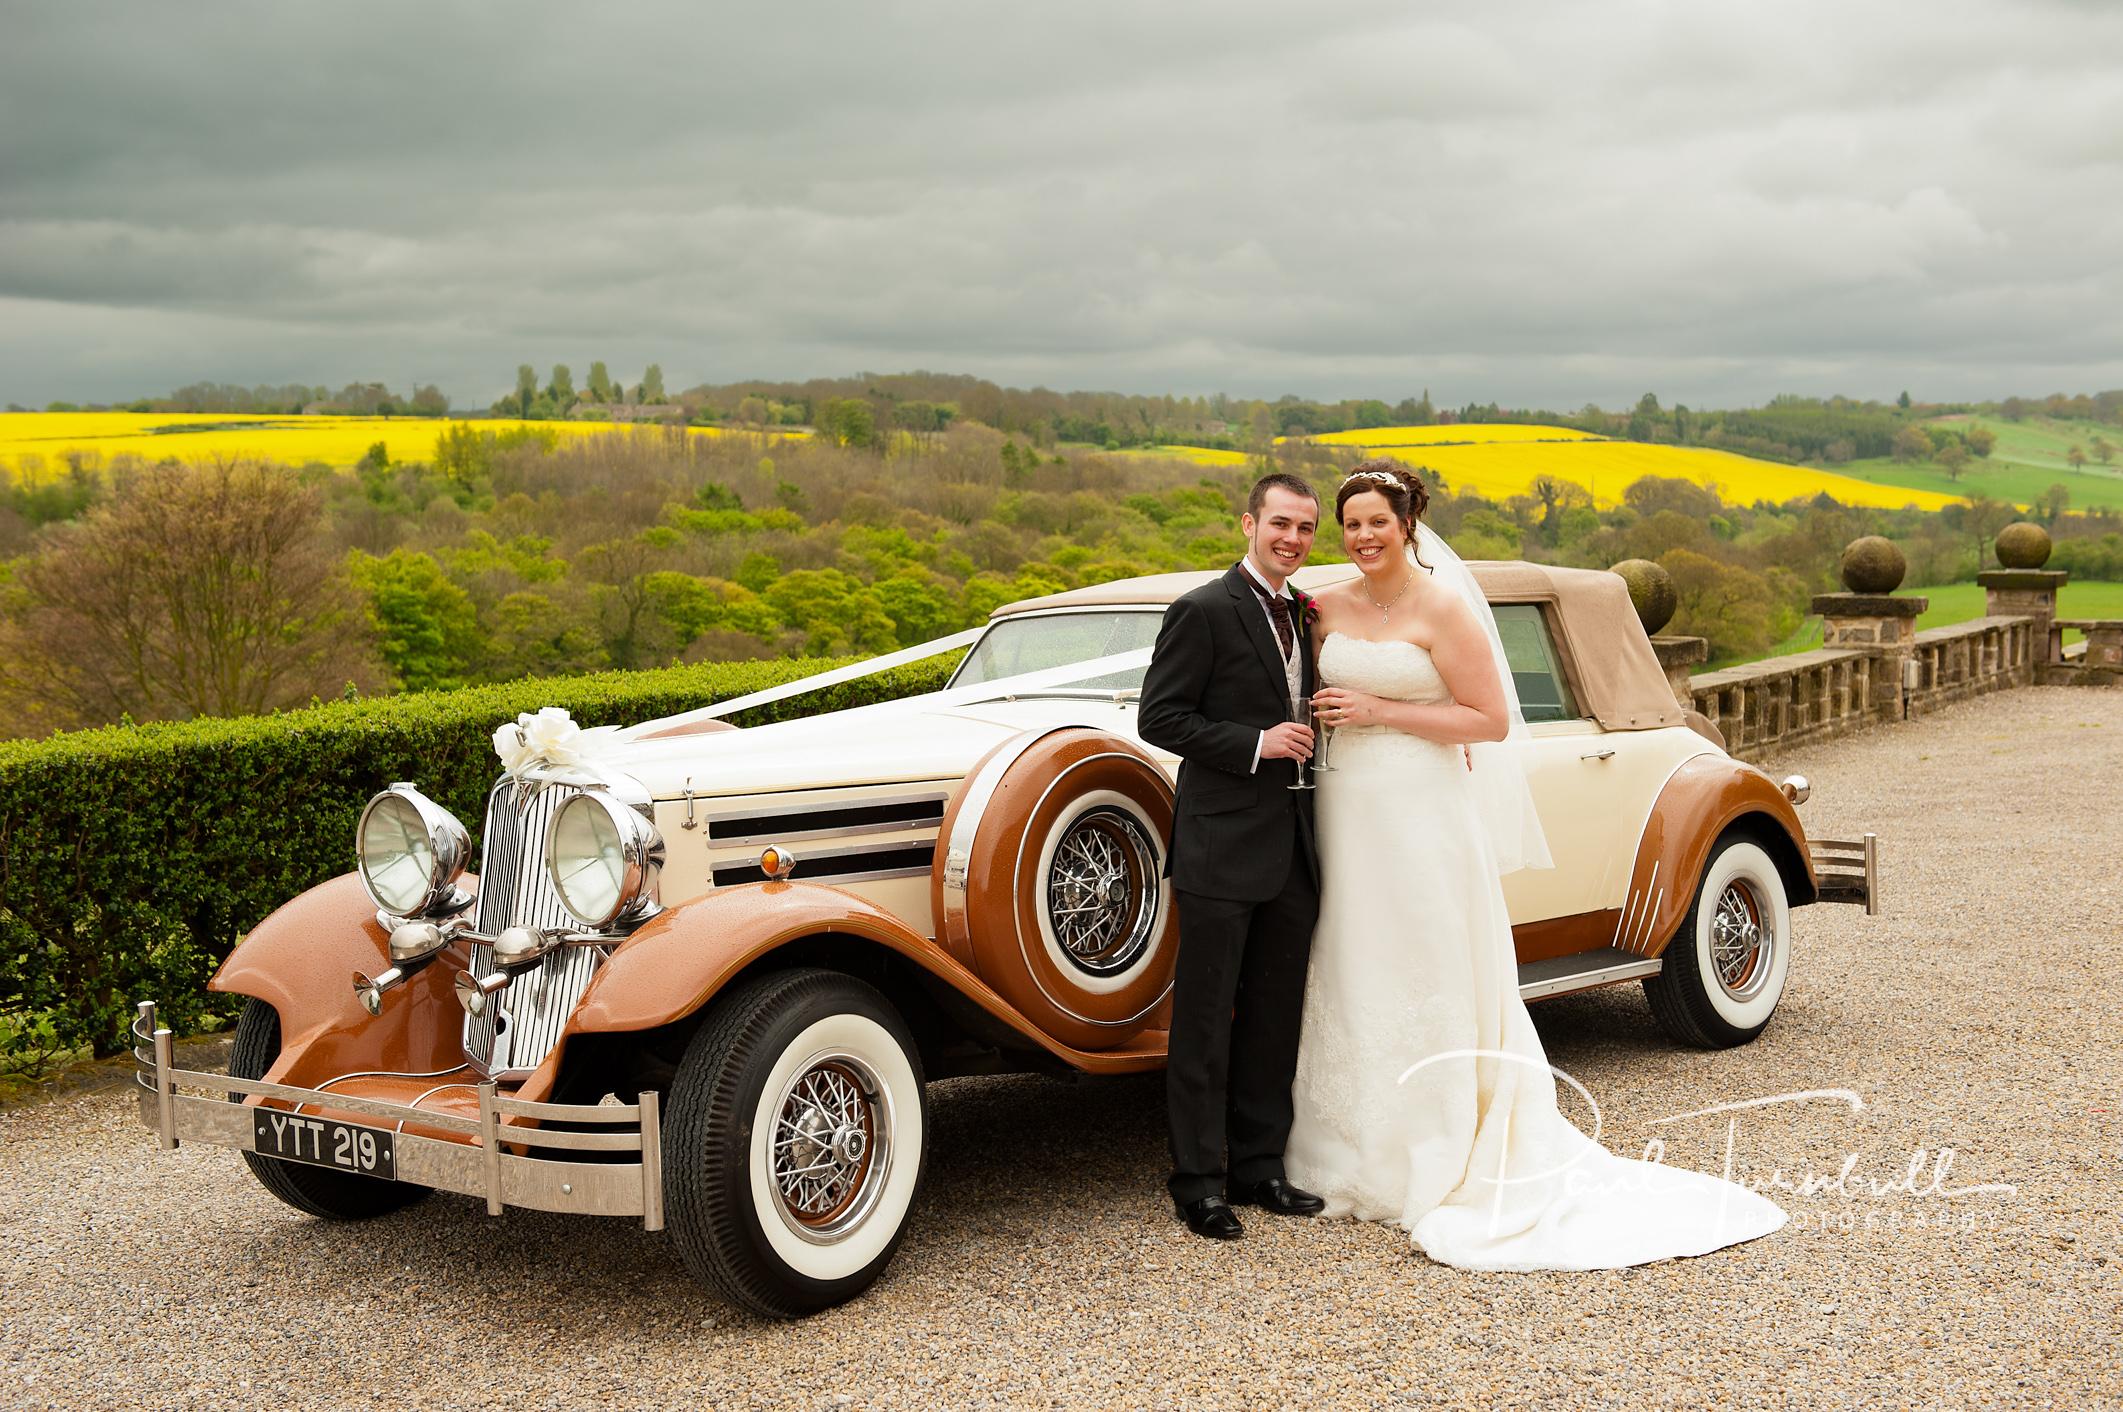 wedding-photography-wood-hall-wetherby-yorkshire-037.jpg